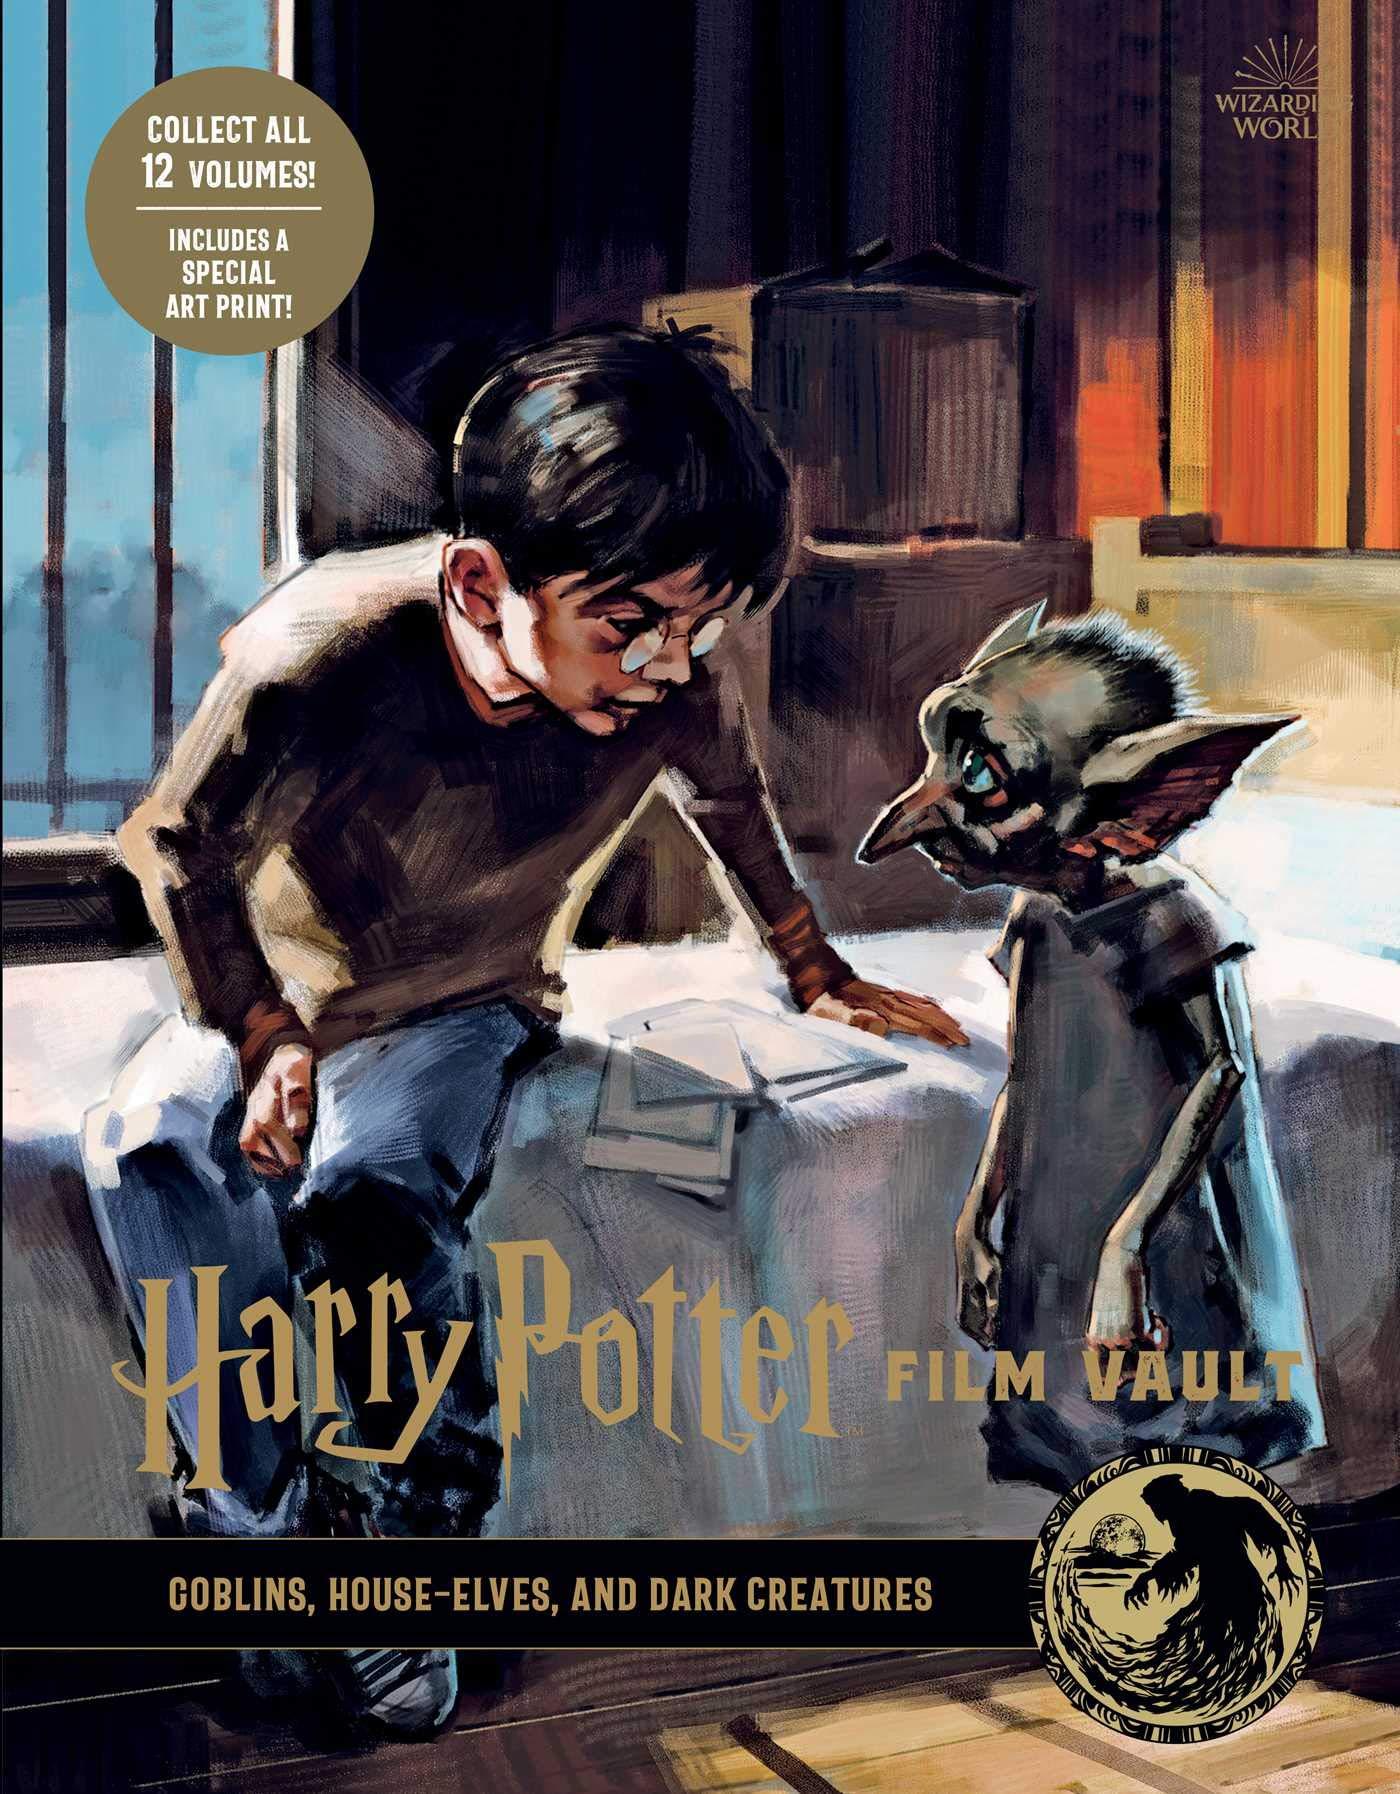 哈利波特電影寶庫 9:妖精、家庭小精靈與黑暗生物 Harry Potter: Film Vault: Volume 9: Goblins, House-Elves, and Dark Creature